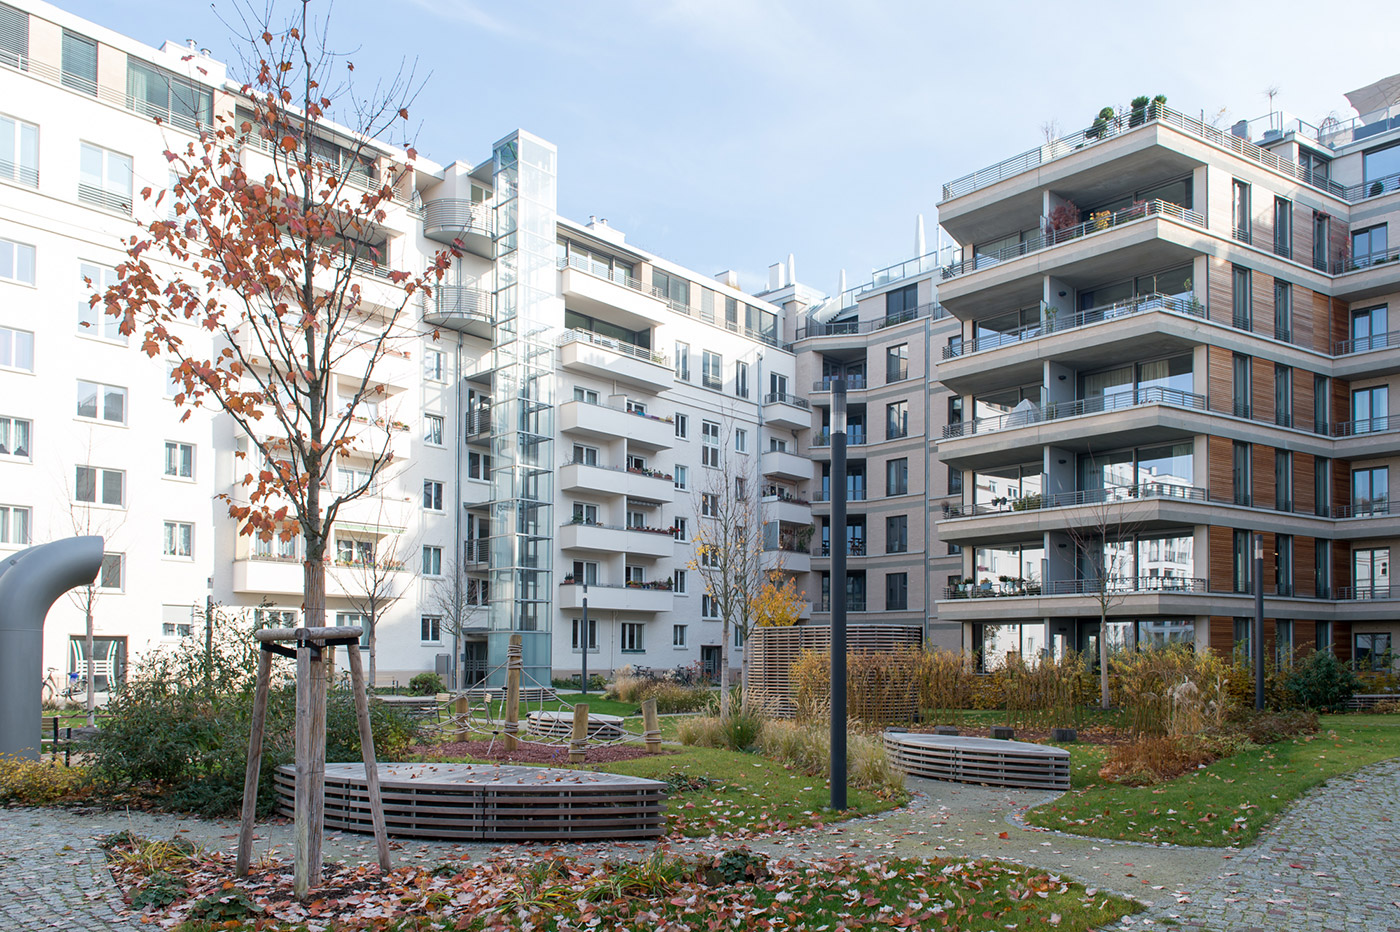 Straßburger Str. - Referenzen - Beck Trockenbau GmbH